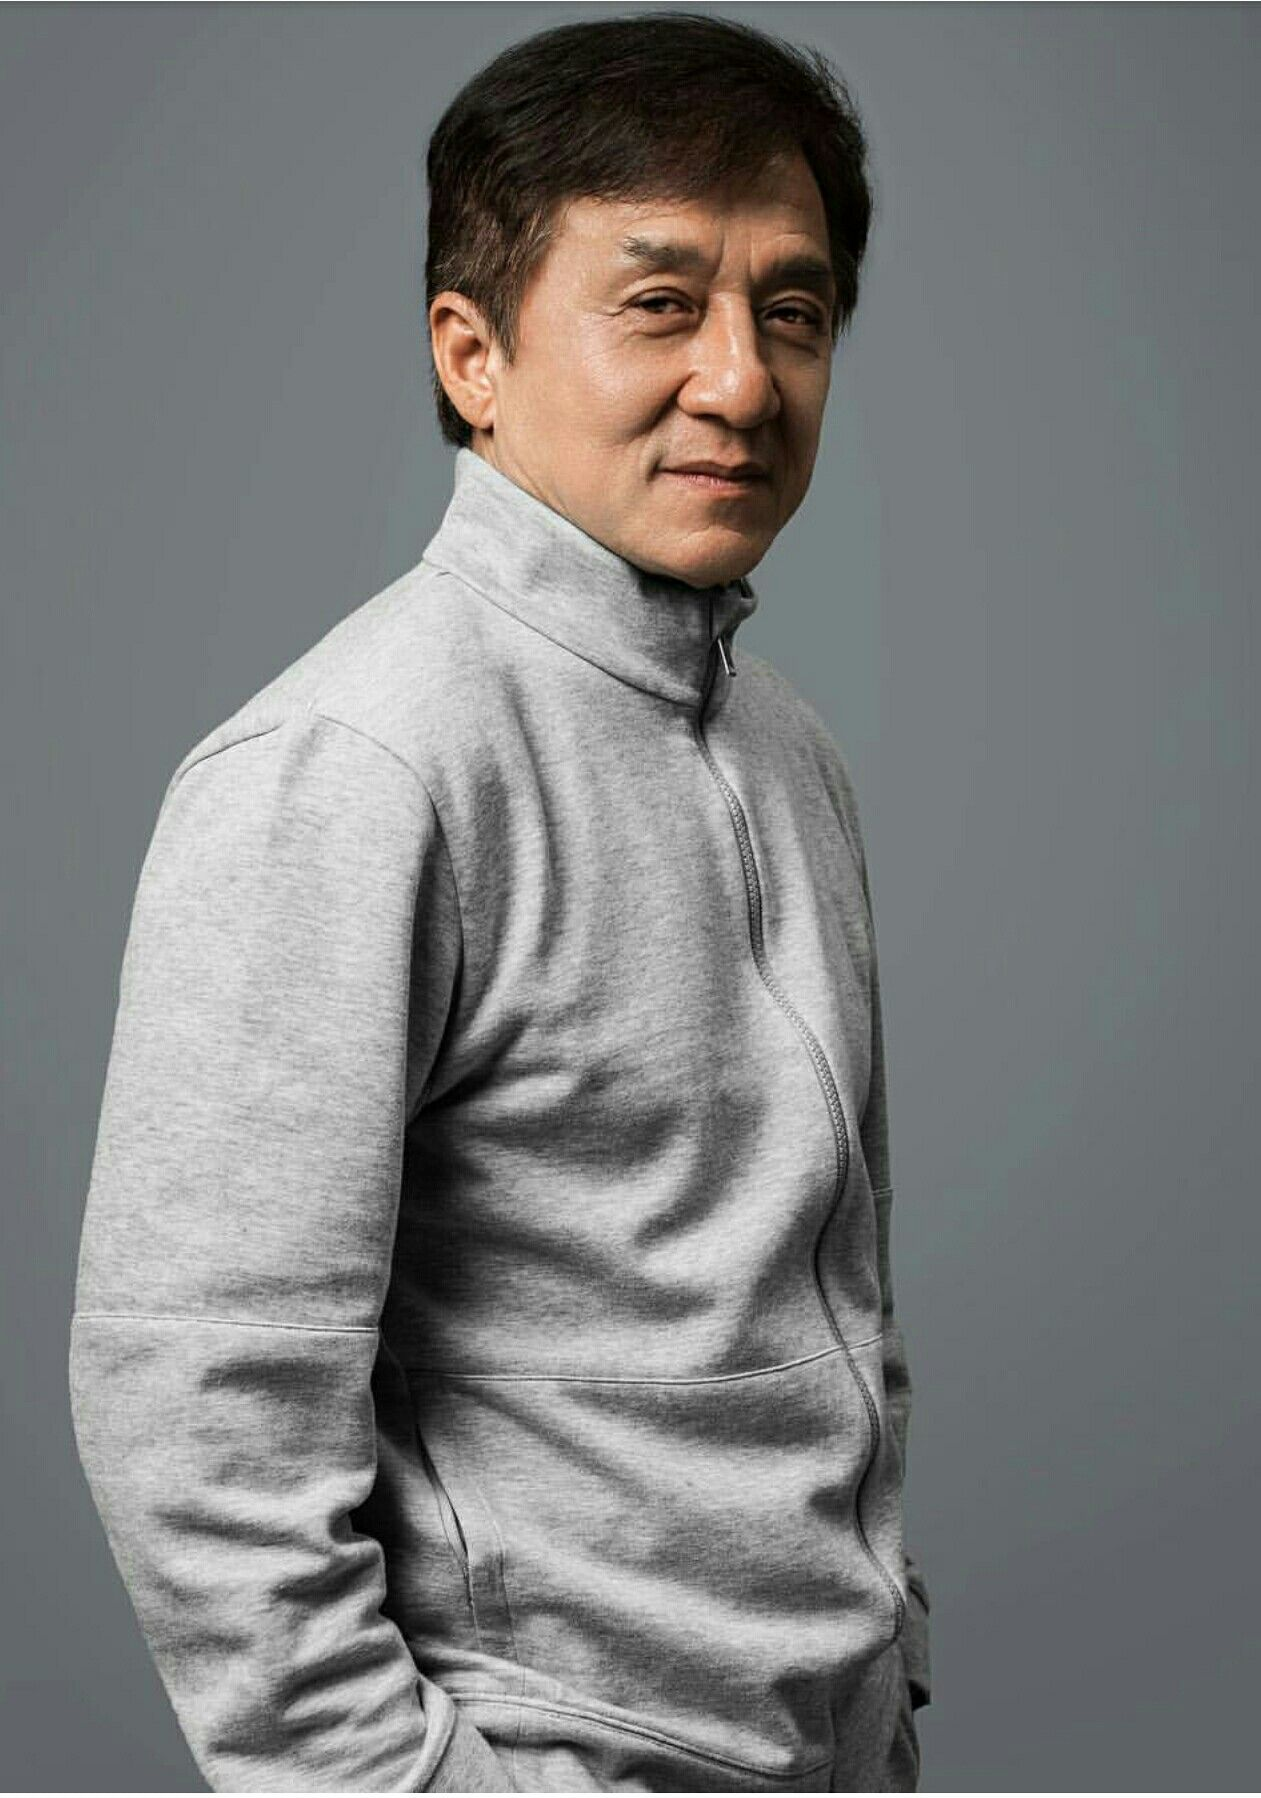 Pin By Branko Paskov On Jackie Chan Jackie Chan Kung Fu Jackie